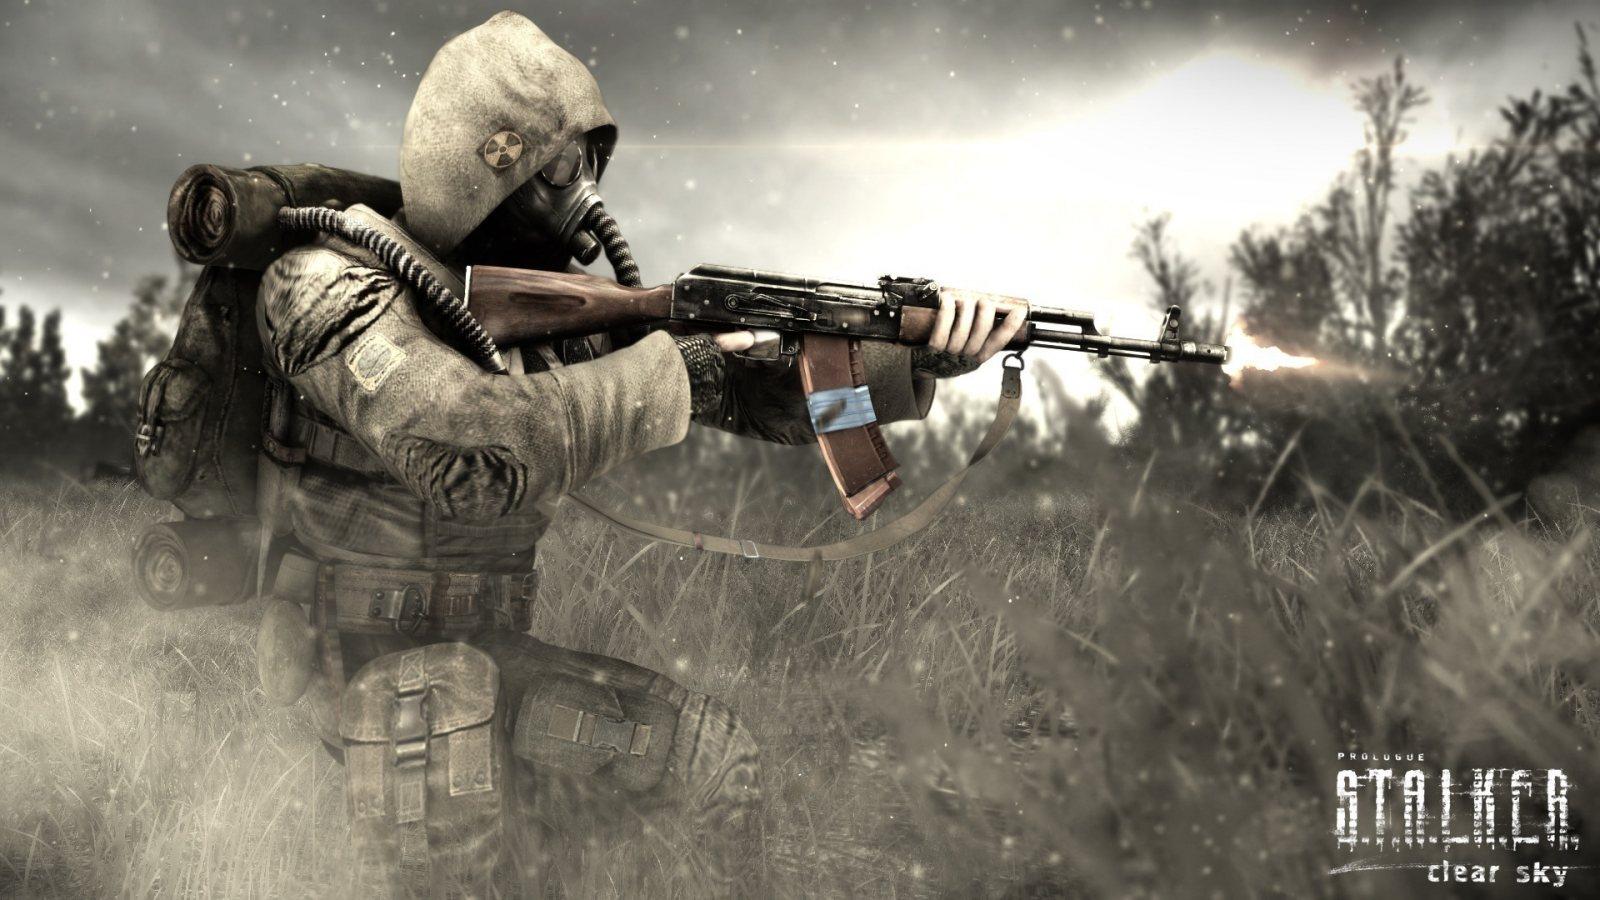 http://1.bp.blogspot.com/-BpjTEEClfrA/T1faBjmMU_I/AAAAAAAAA0I/eOPfkIGnmJ0/s1600/Stalker_Clear_Sky_Soldier_Mask_and_Ak_47_HD_Wallpaper_gWb.jpg